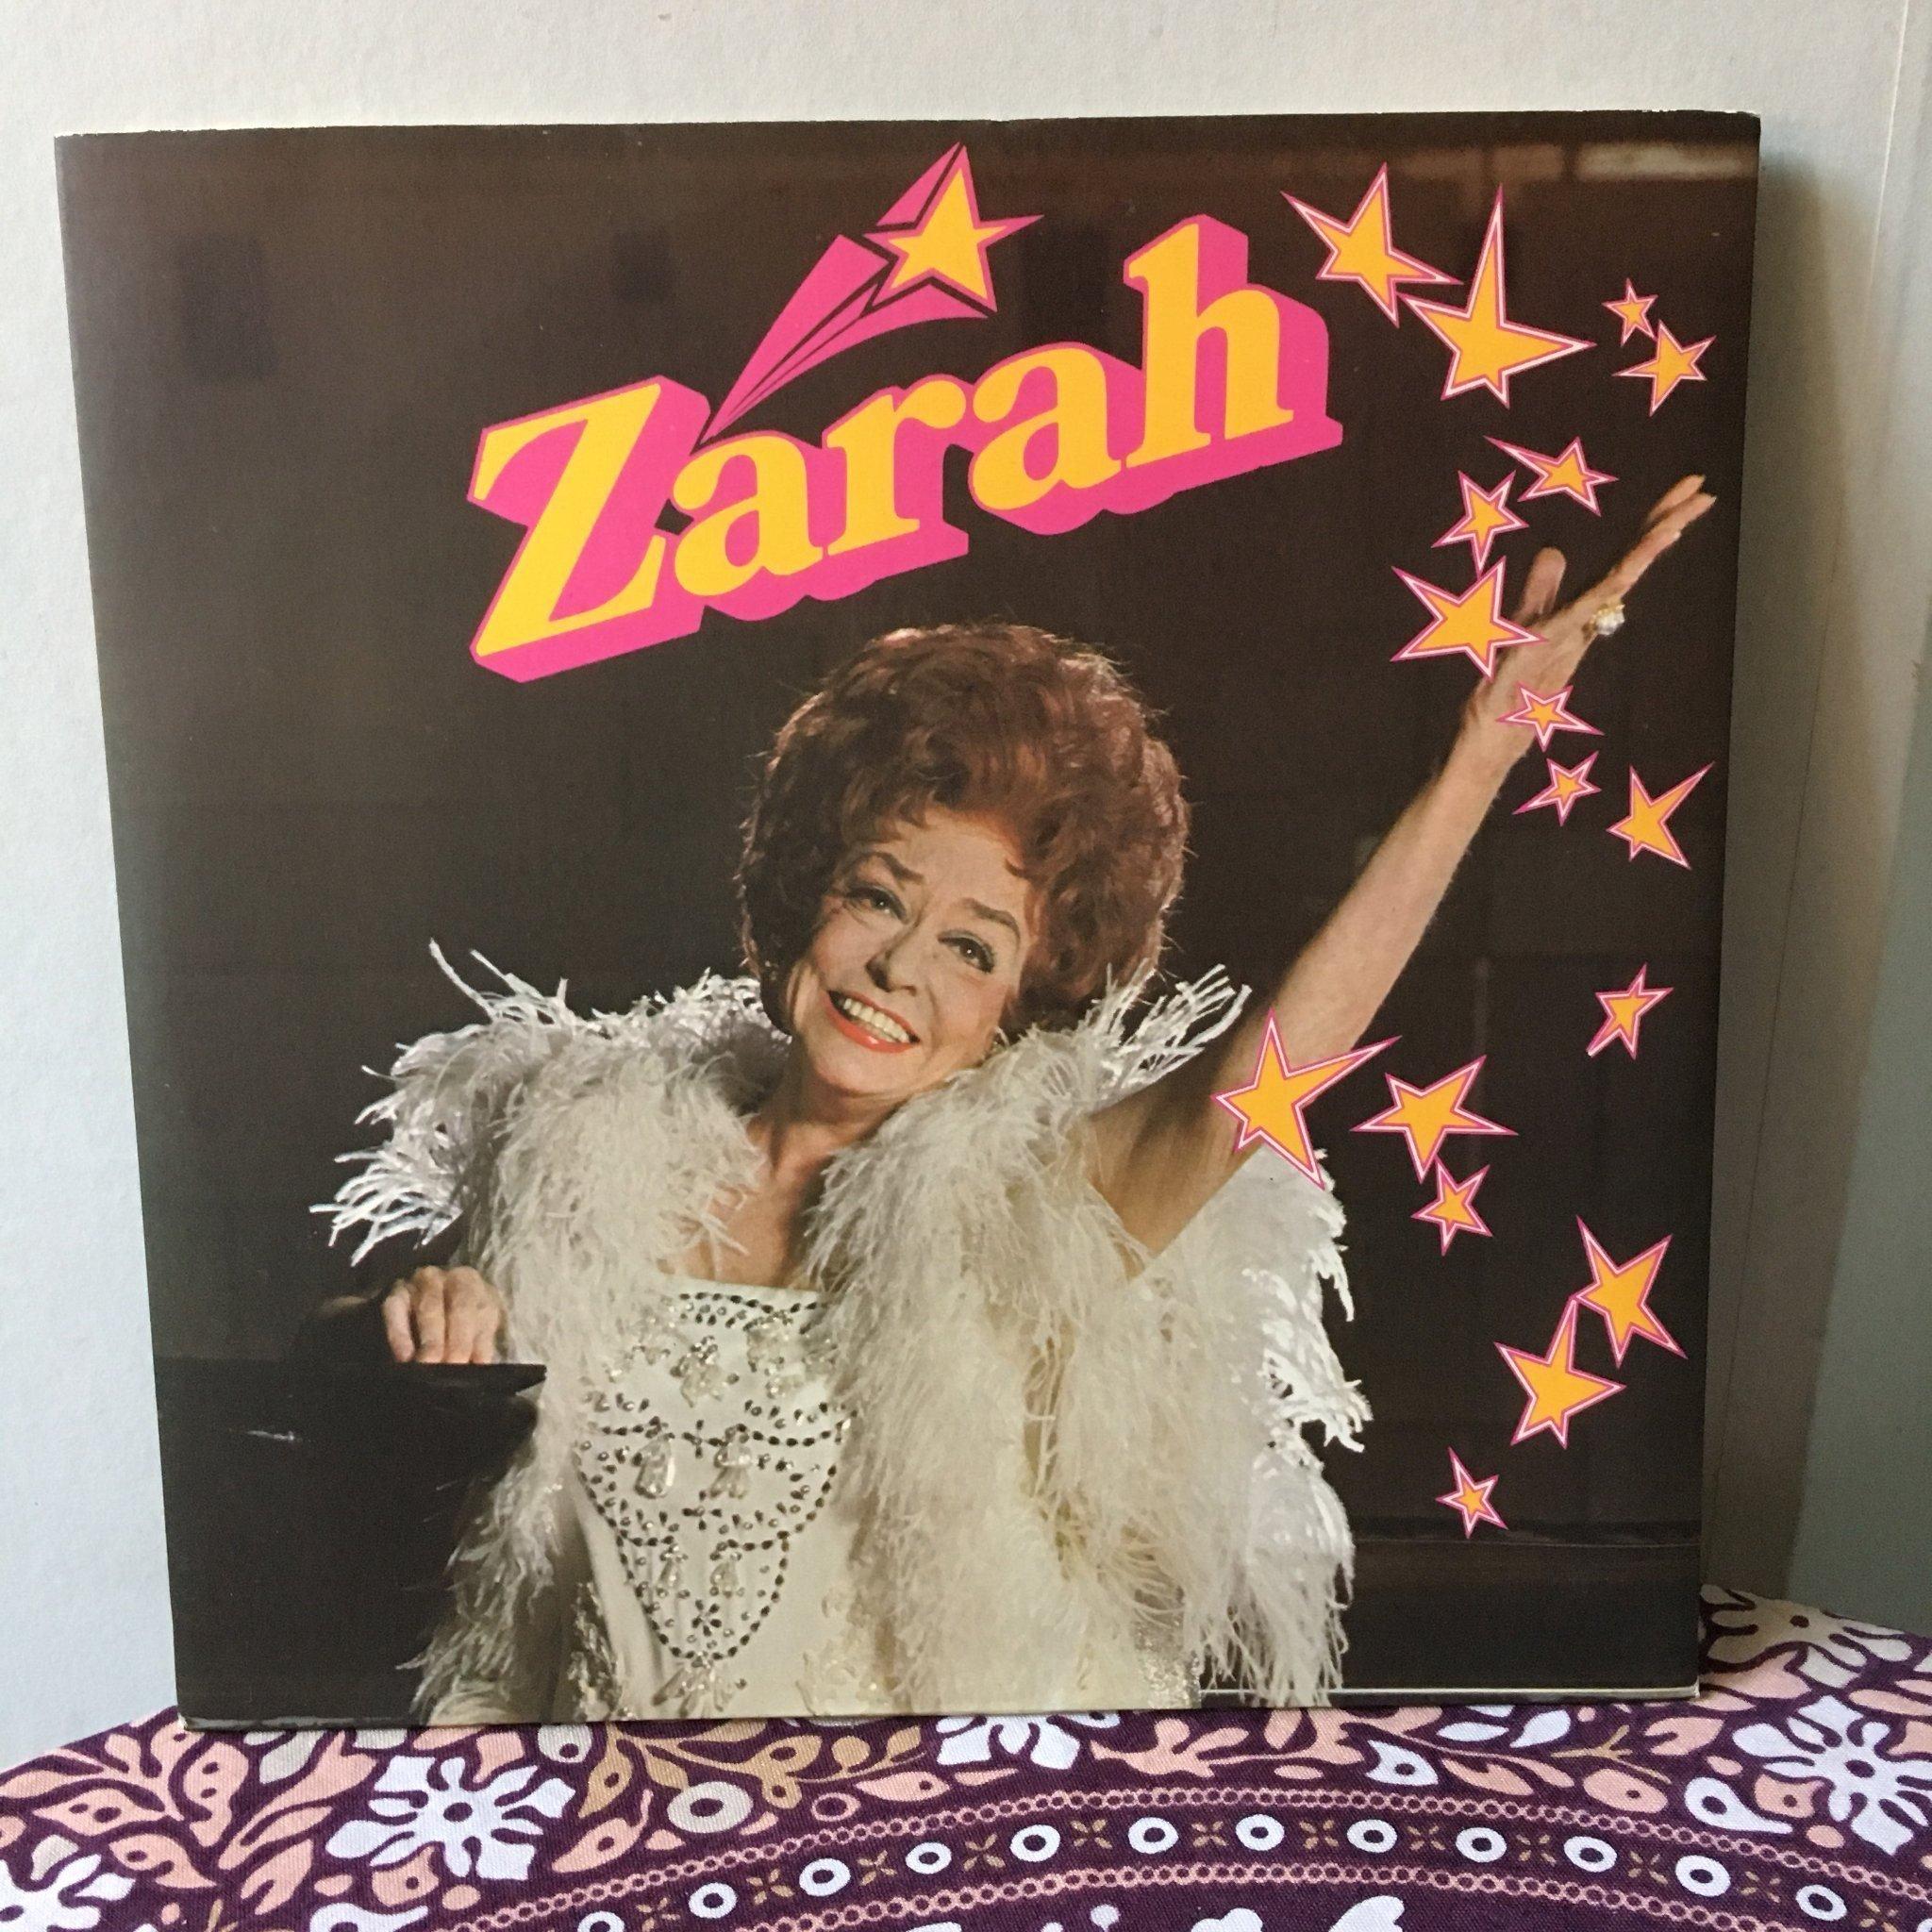 Zarah Leander | Zarah Leander (1907 - 1981). Diese ...  |Zarah Leander Live 1973